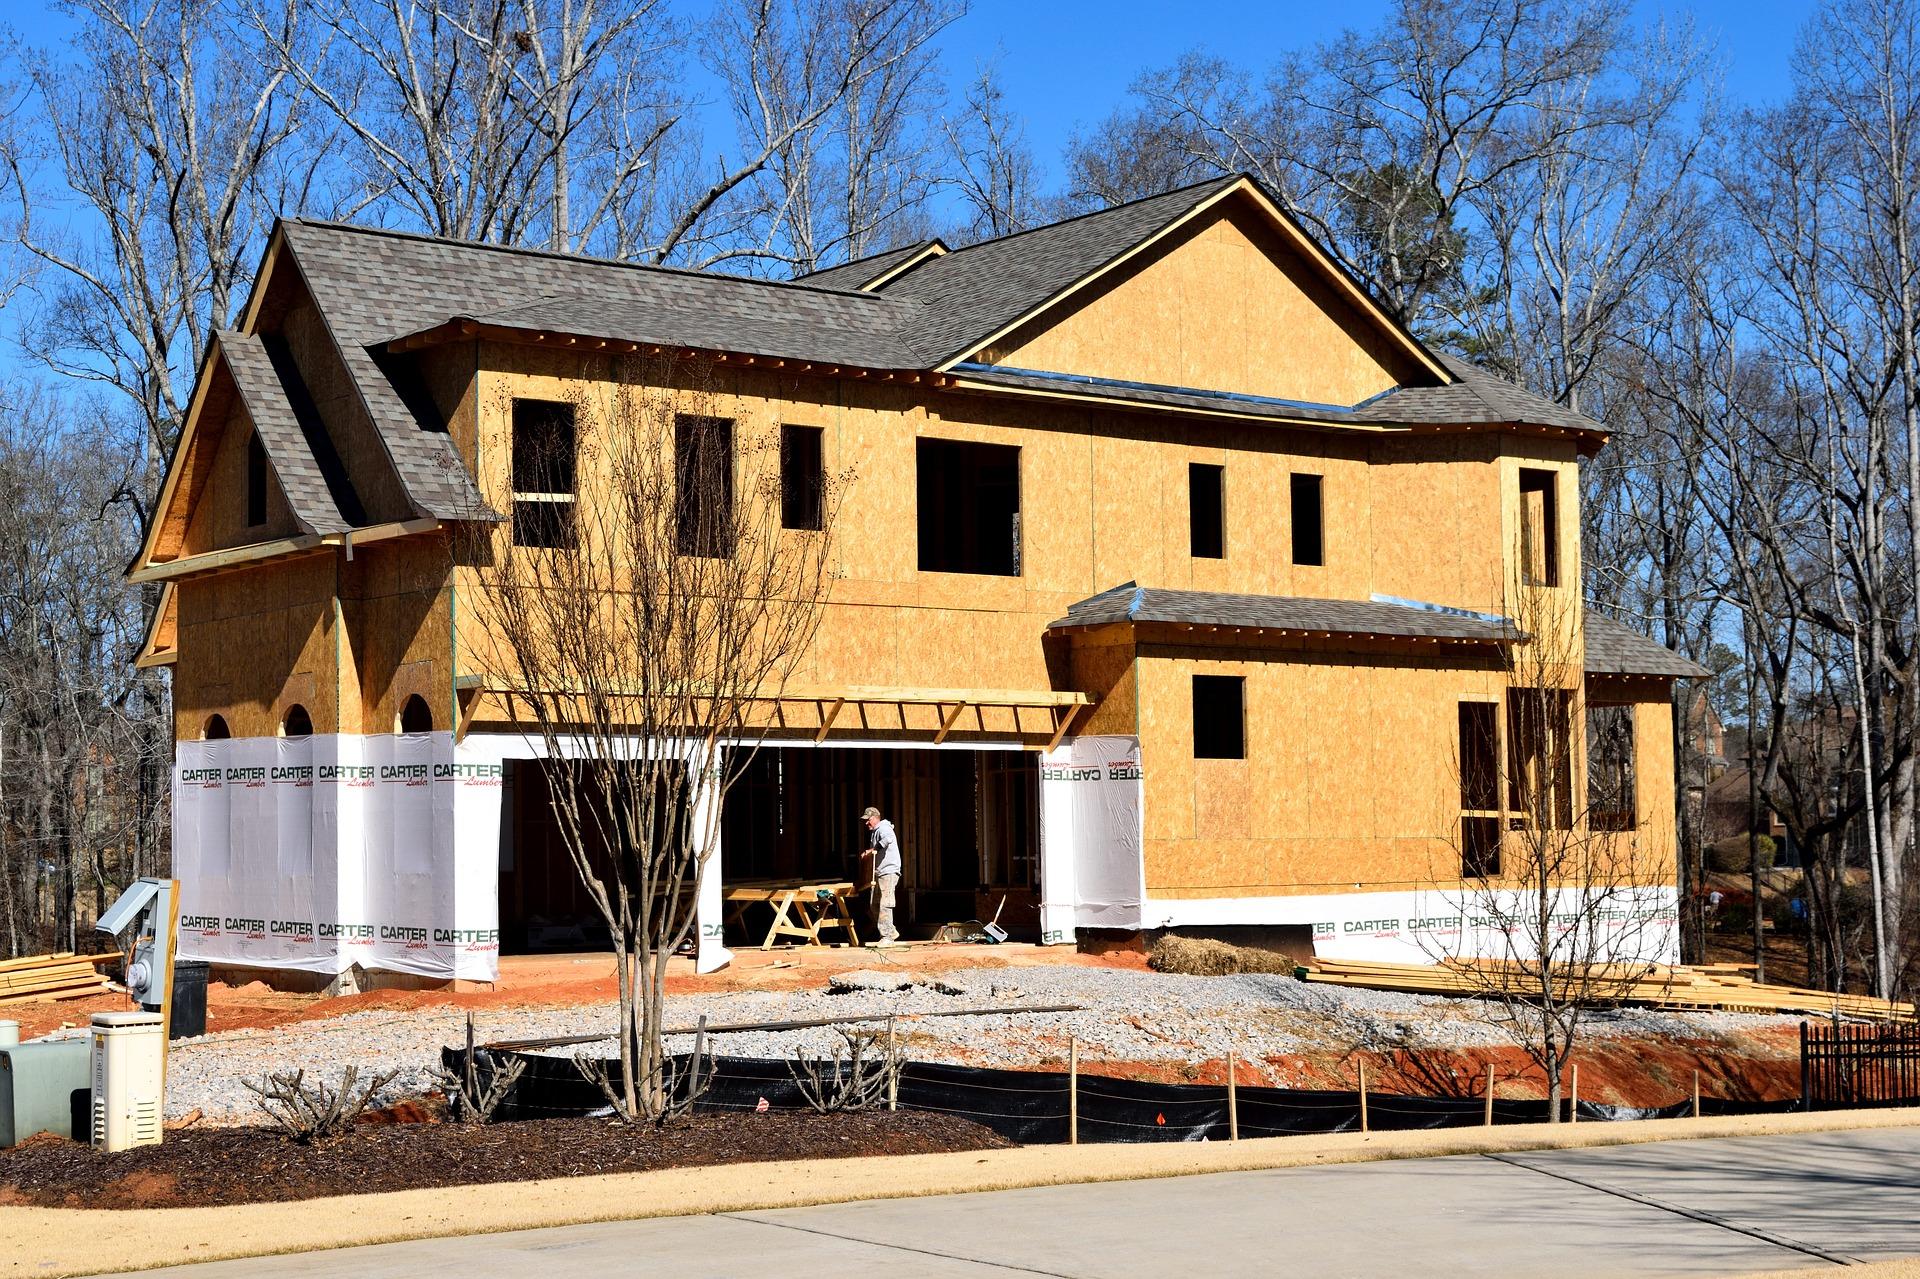 Photo: New house under construction